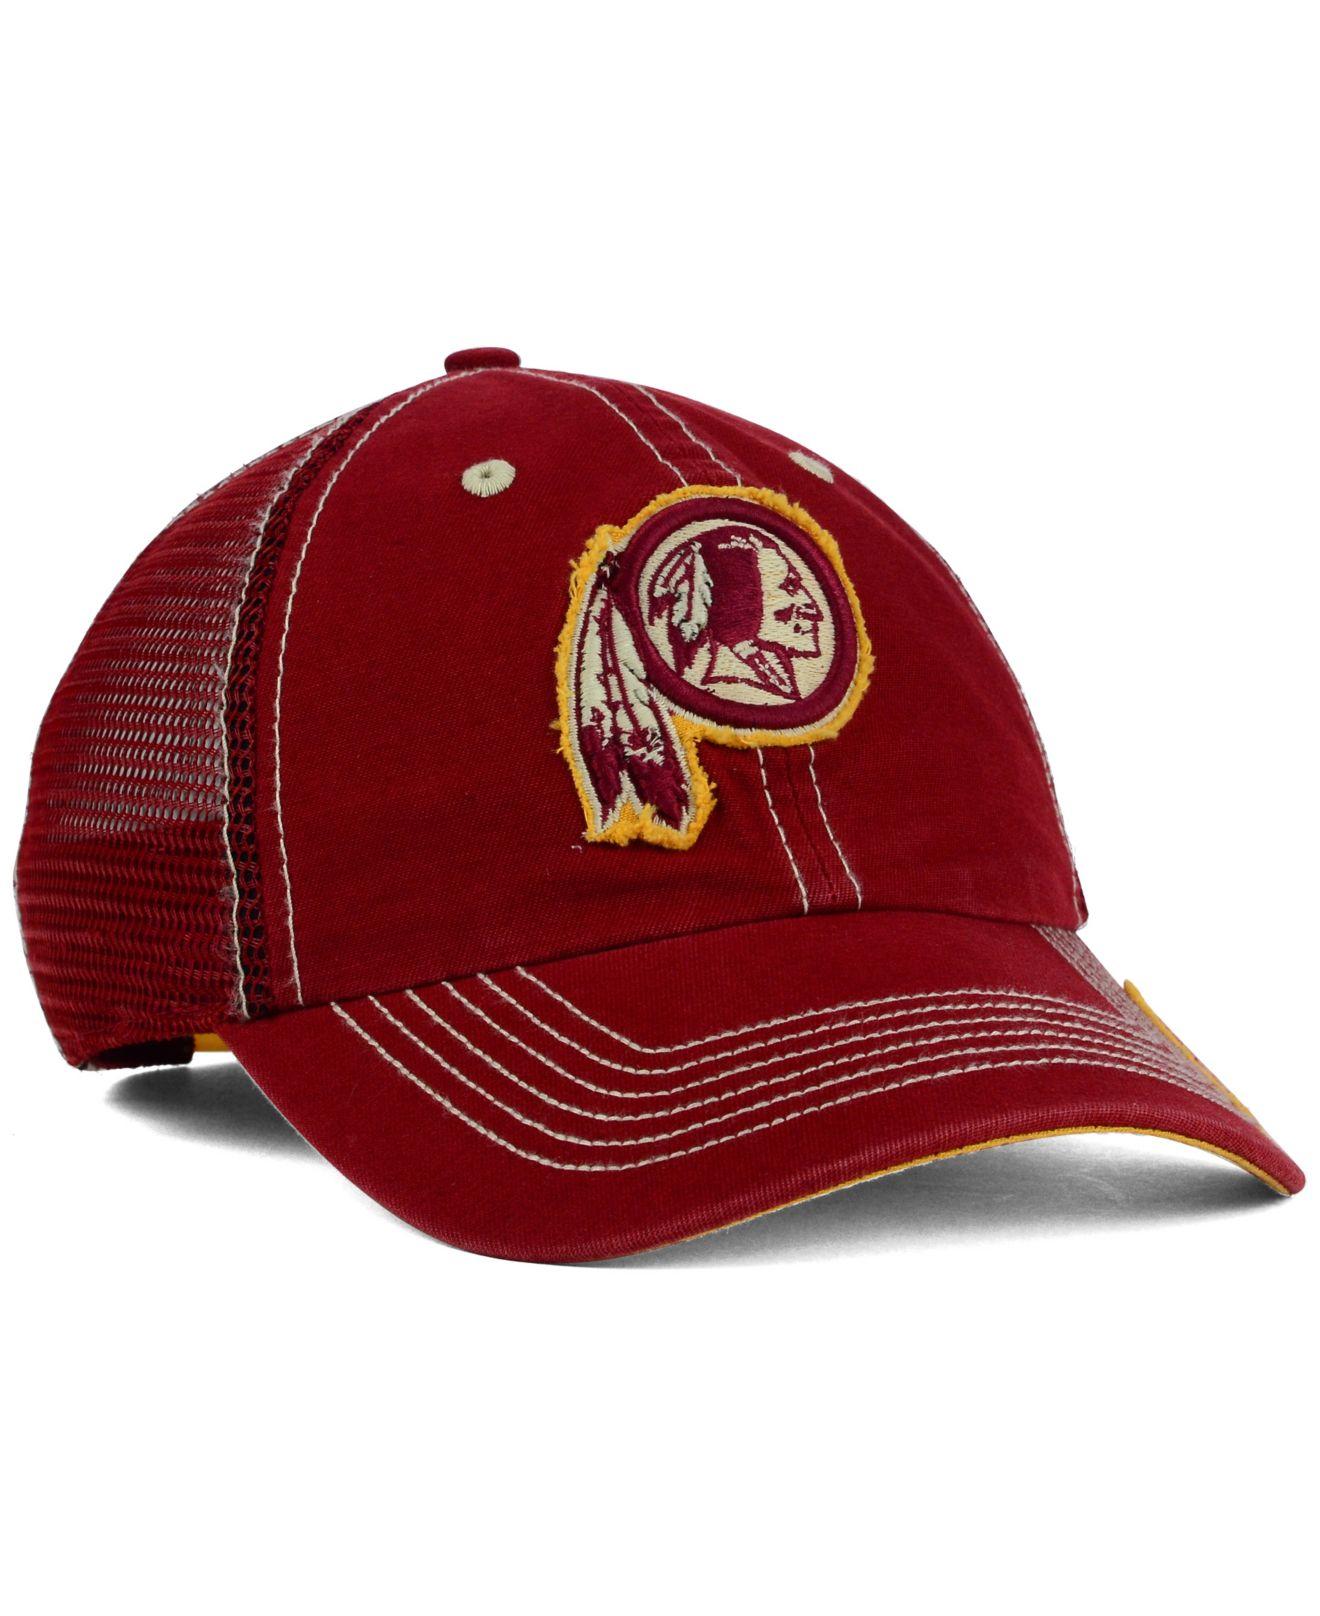 30f0627032a87 Lyst - 47 Brand Washington Redskins Turner Mesh Clean Up Cap in ...